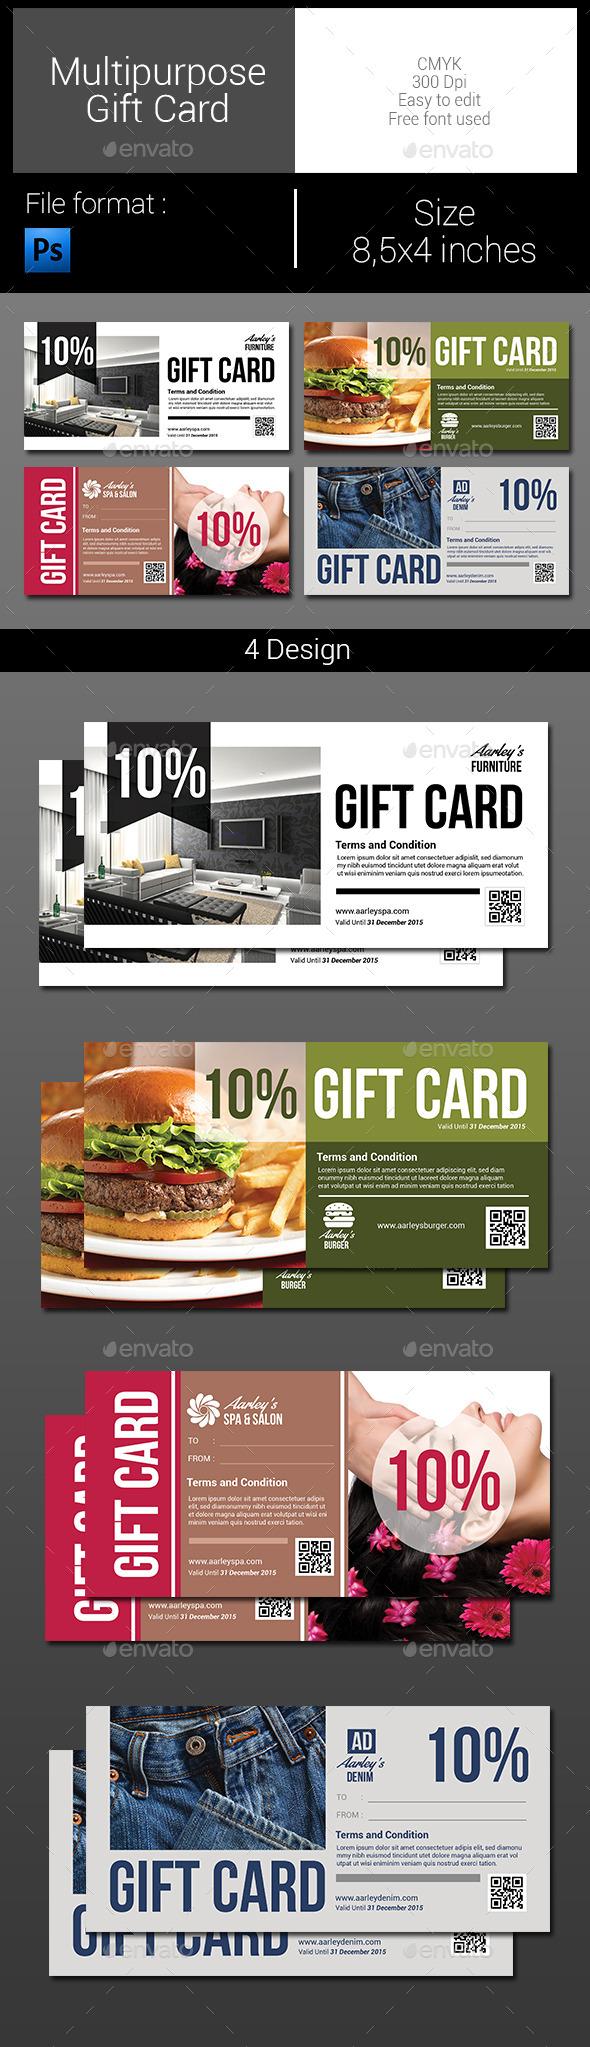 GraphicRiver Multipurpose Gift Card 9966465